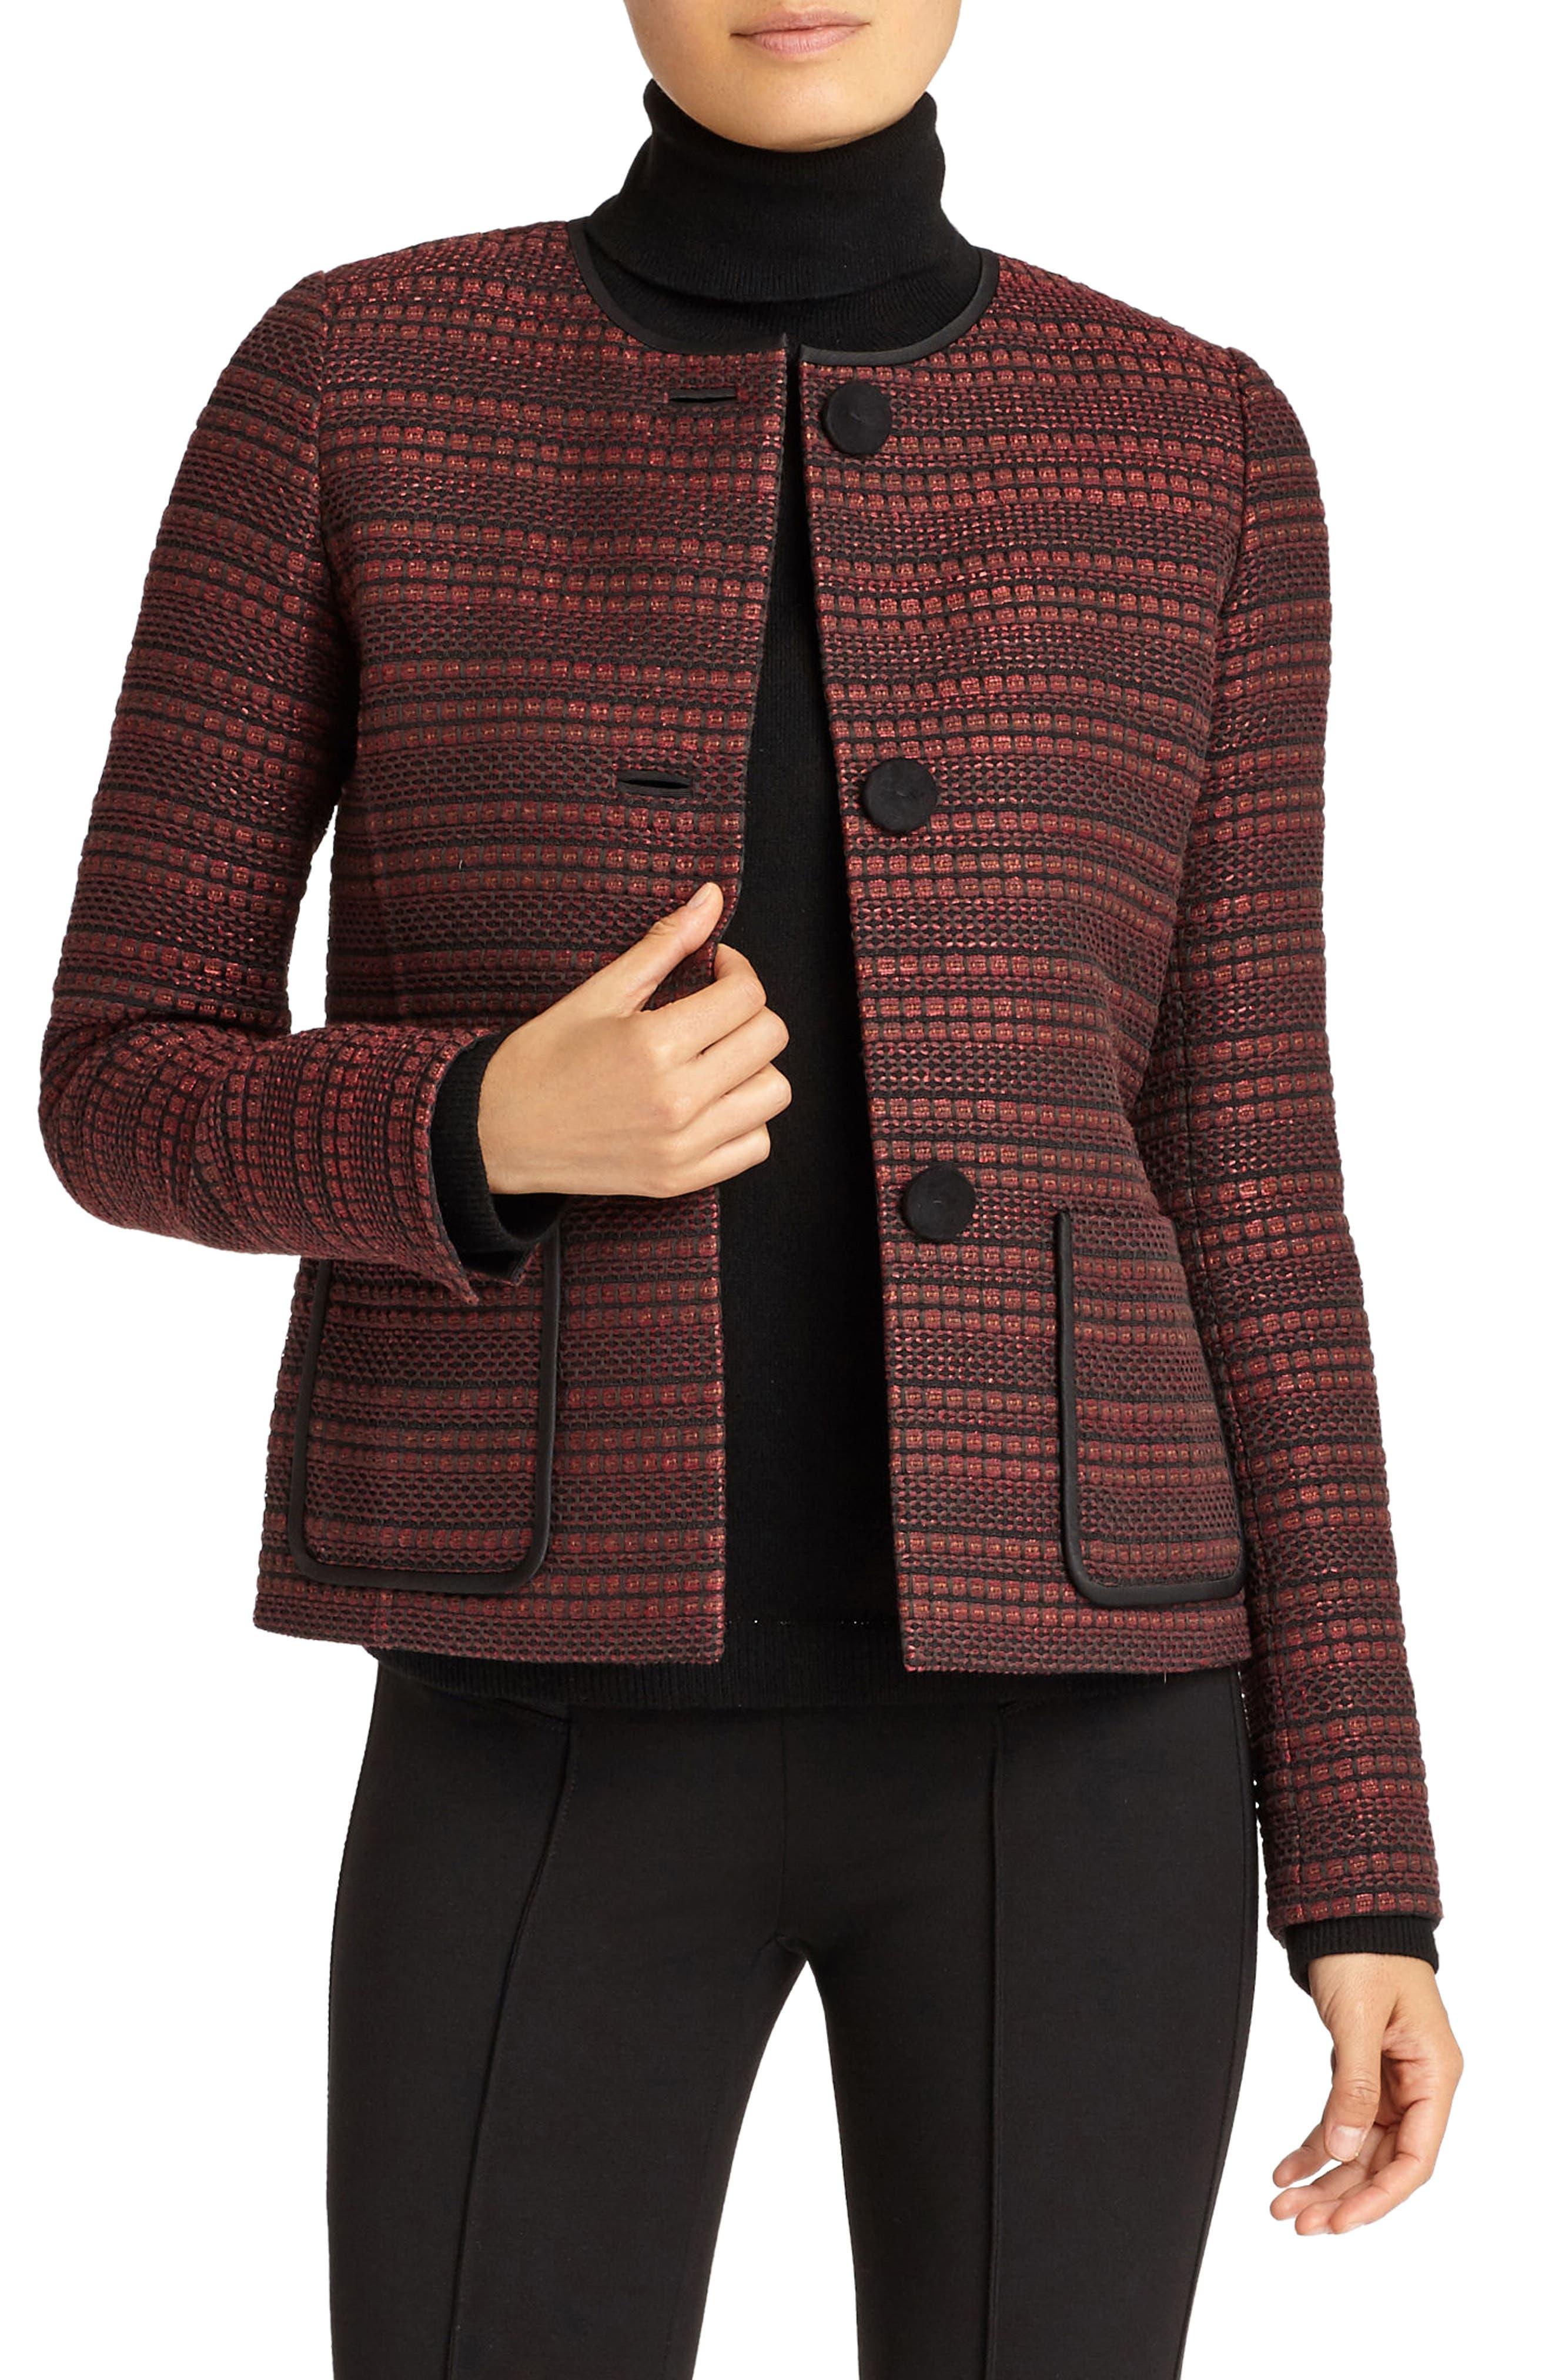 Laurence Venetian Tweed Jacket,                             Alternate thumbnail 4, color,                             Shiraz Multi